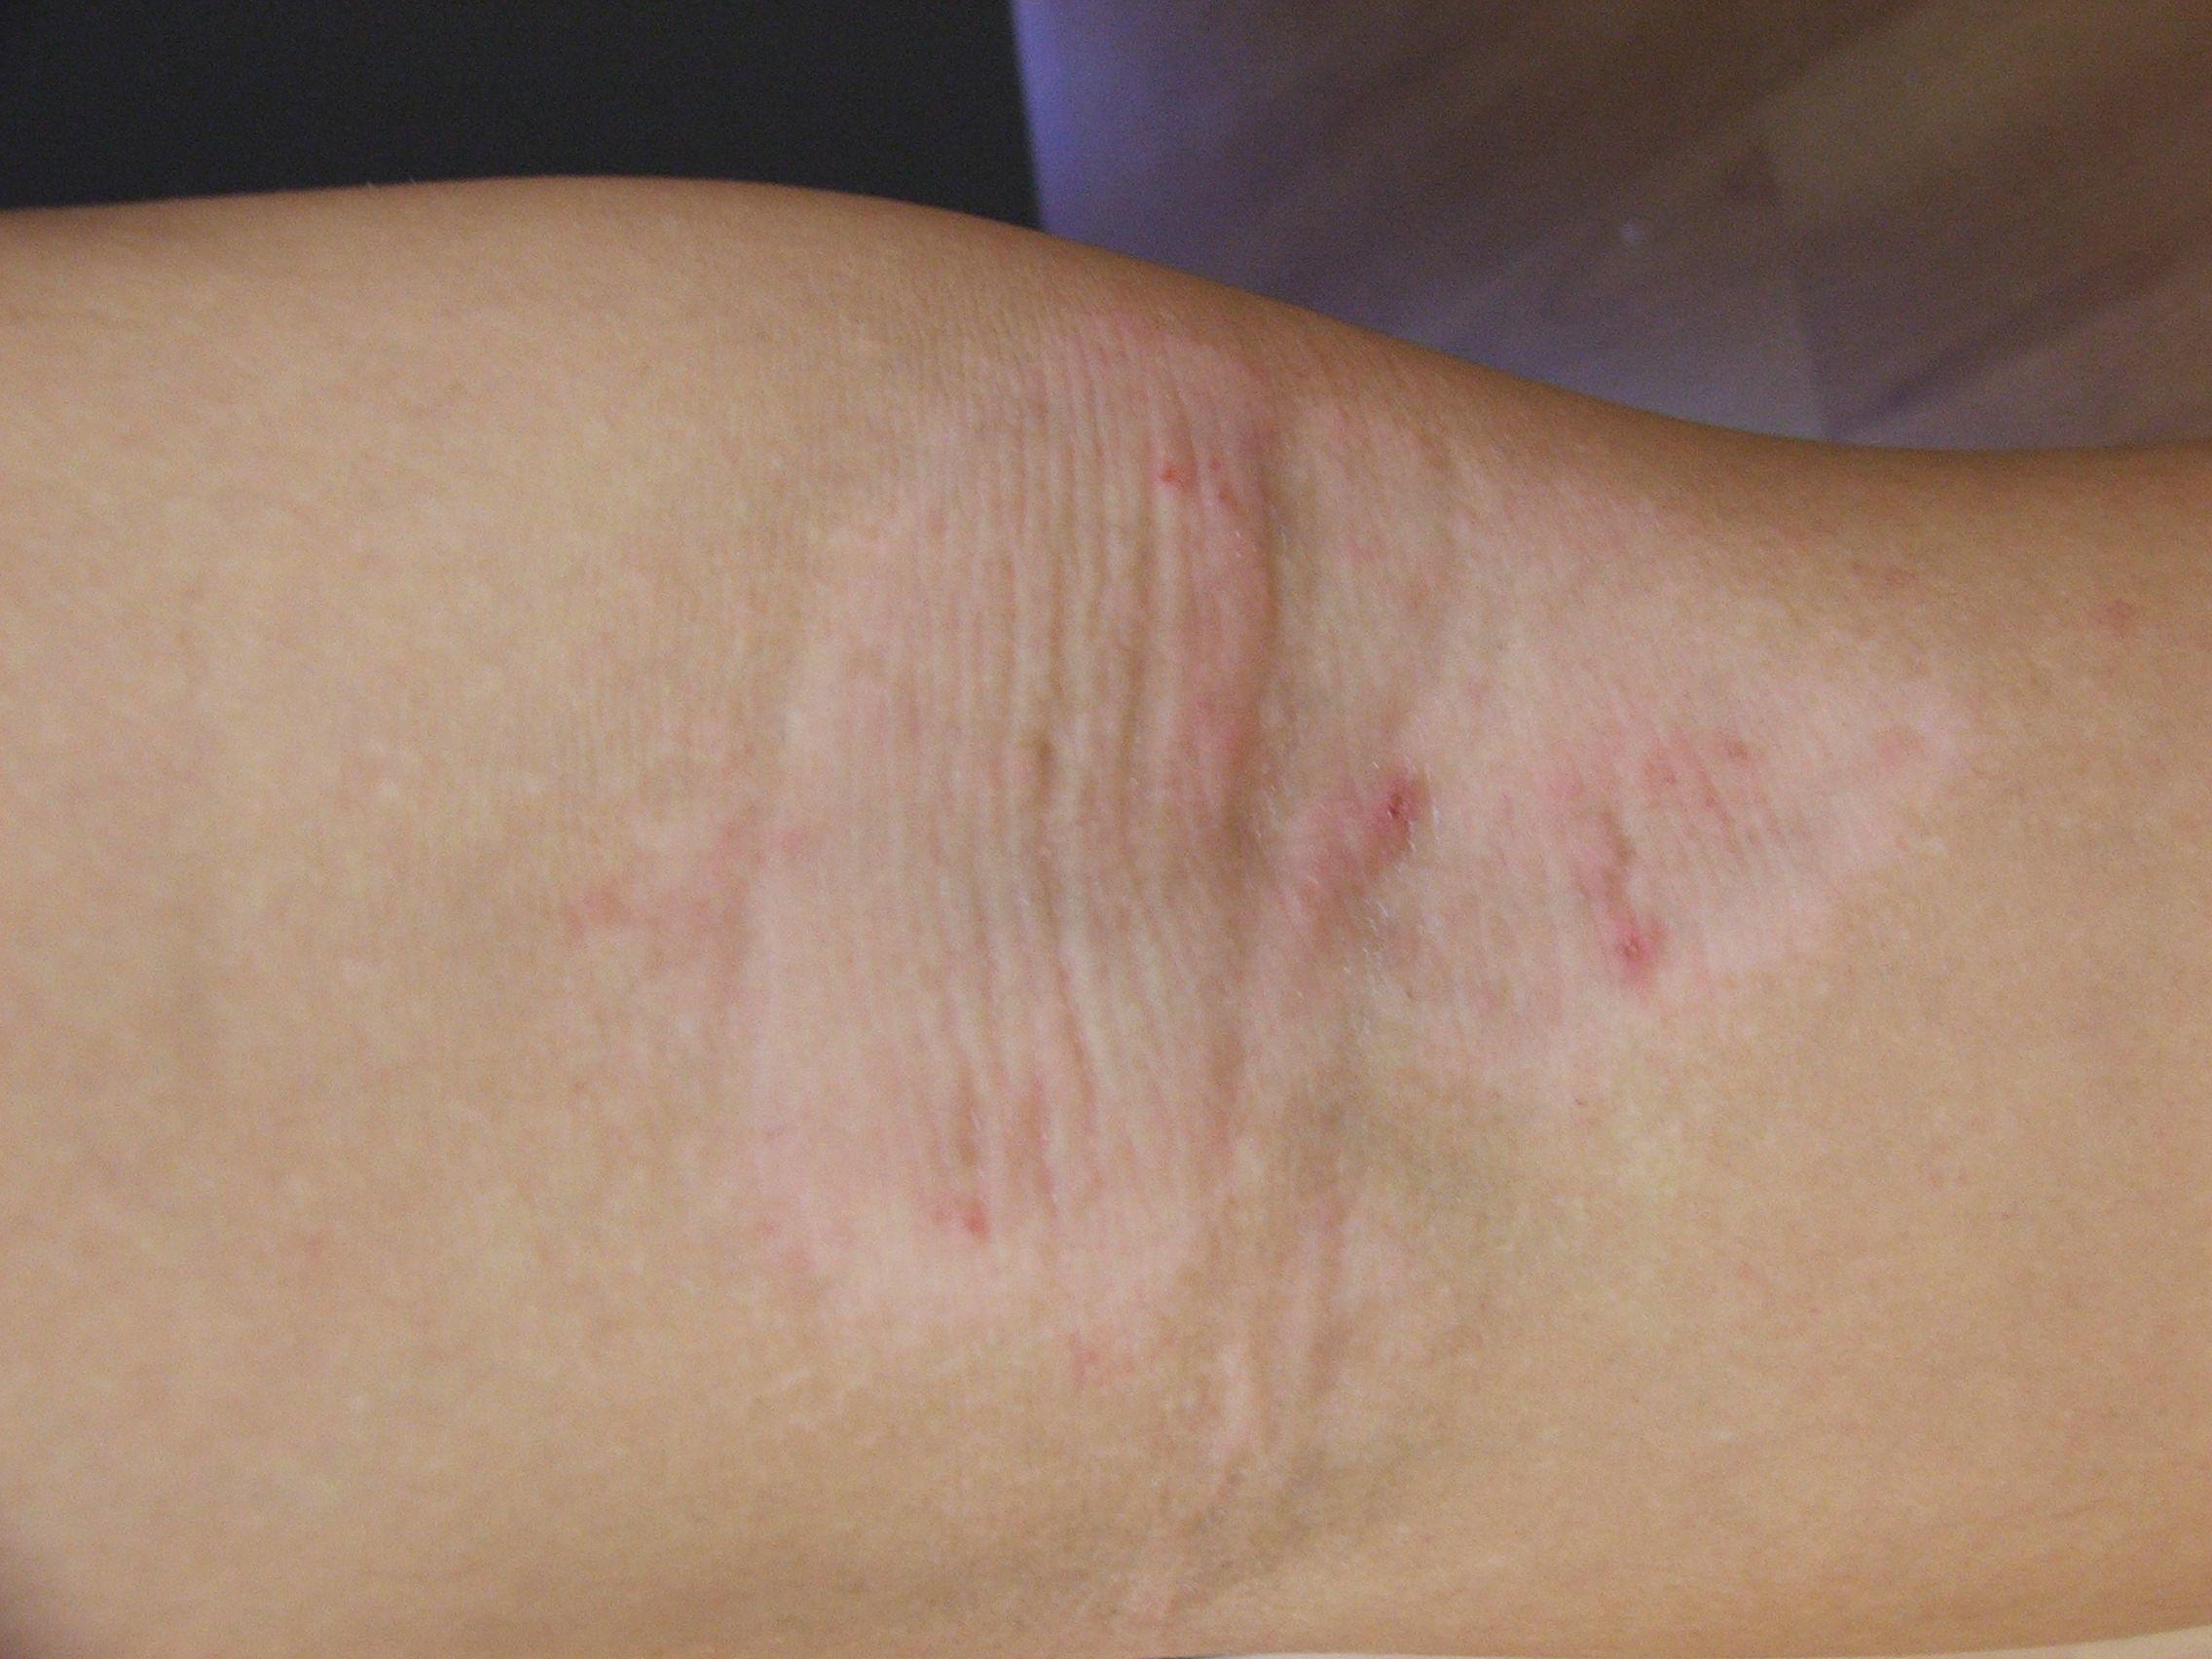 Pin by Zeynep Ibrahim on dermatology   Eczema treatment, Skin clinic ...